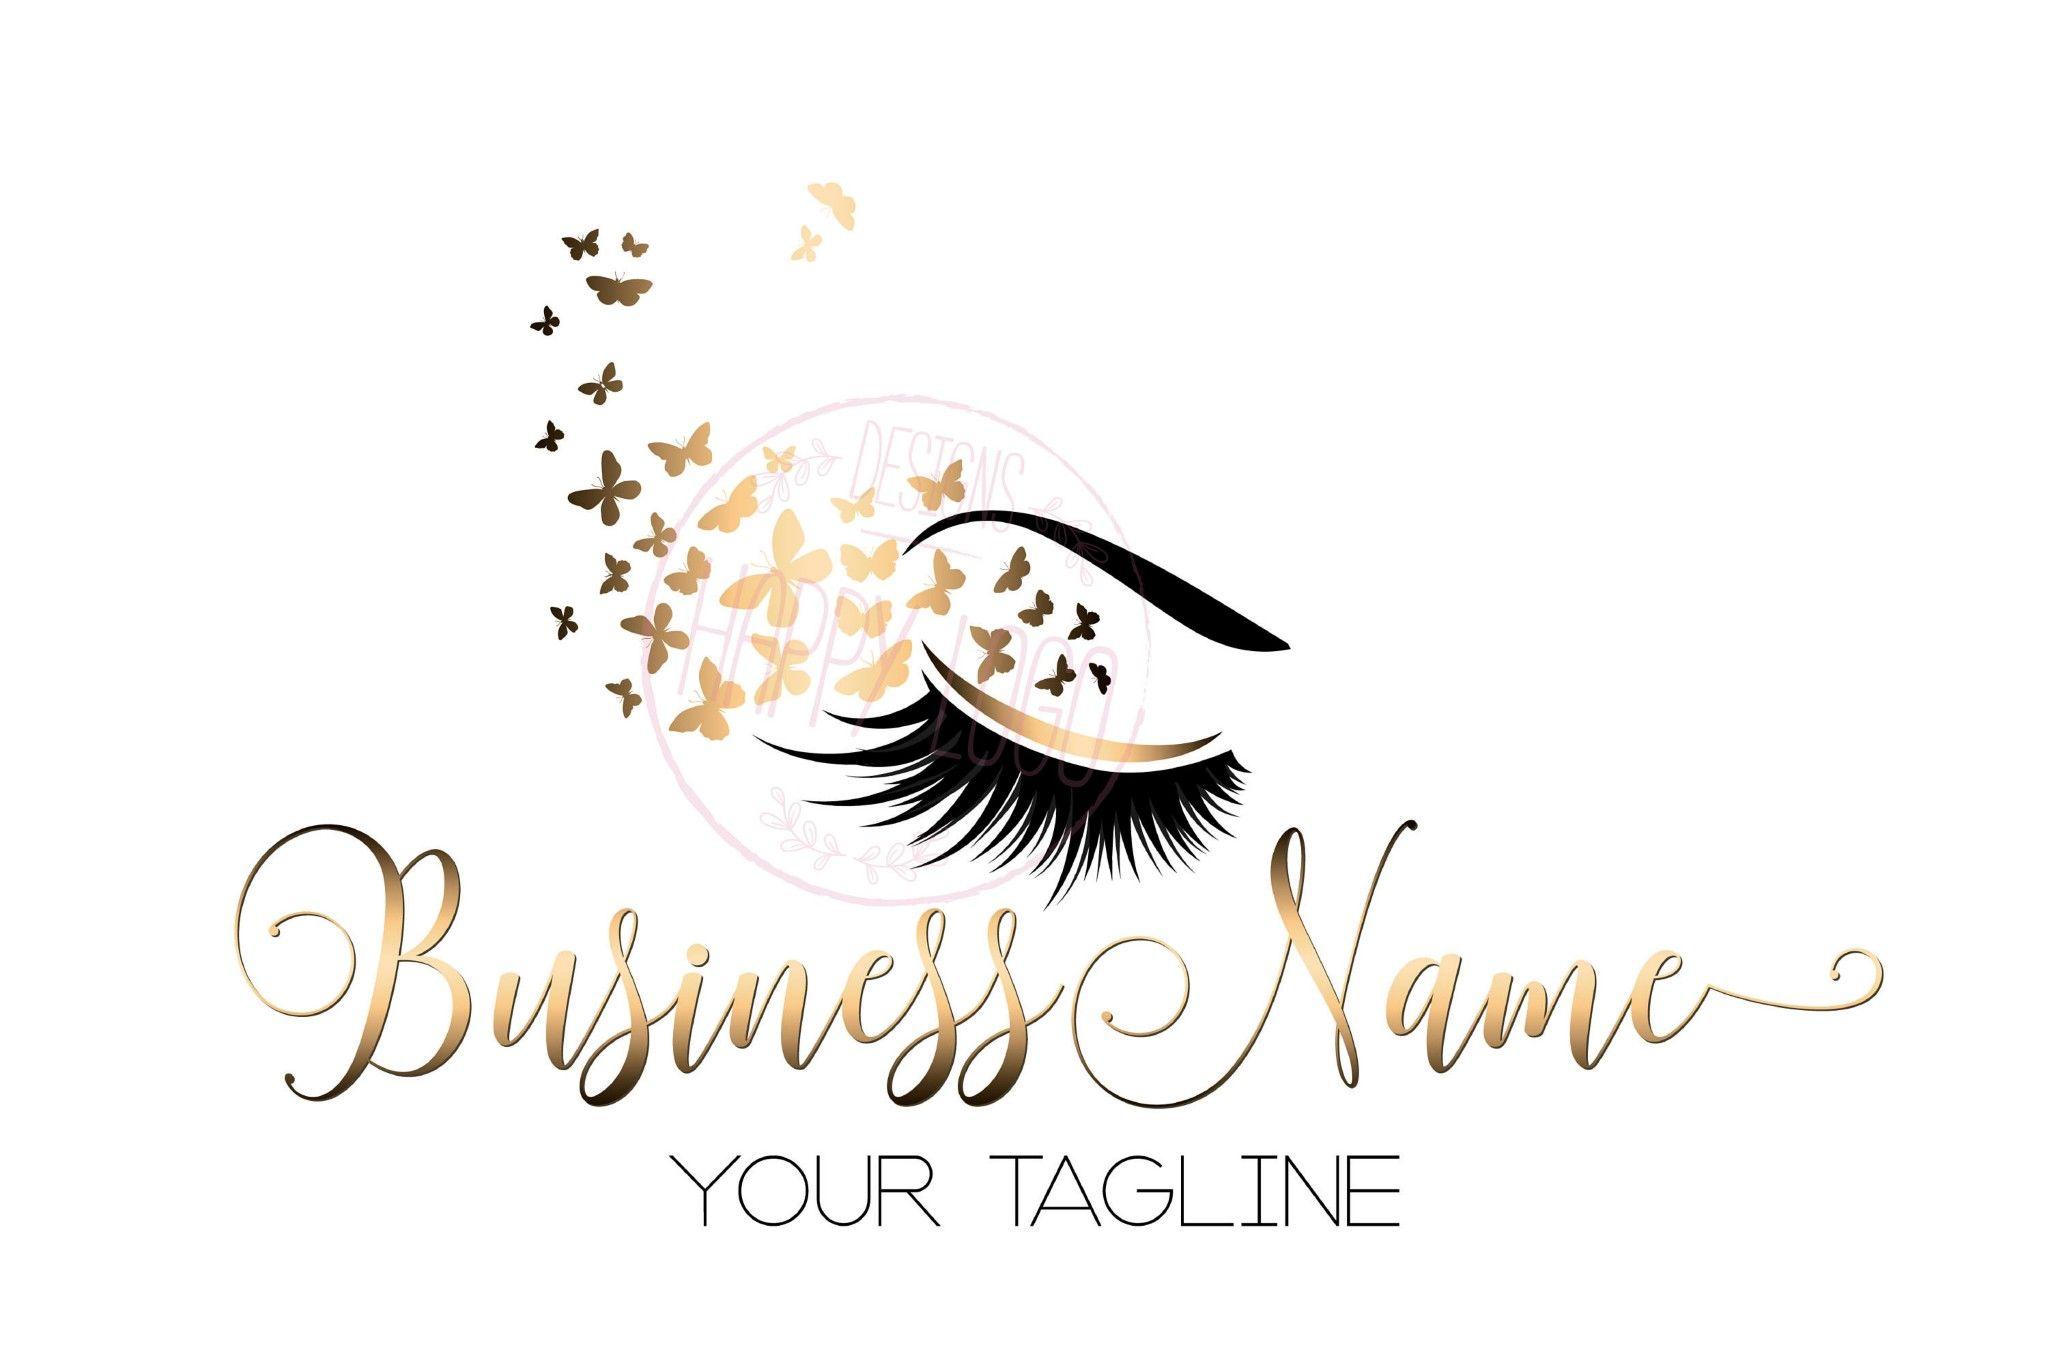 Pin by baran mim on lash Lashes logo, Eyelash extensions